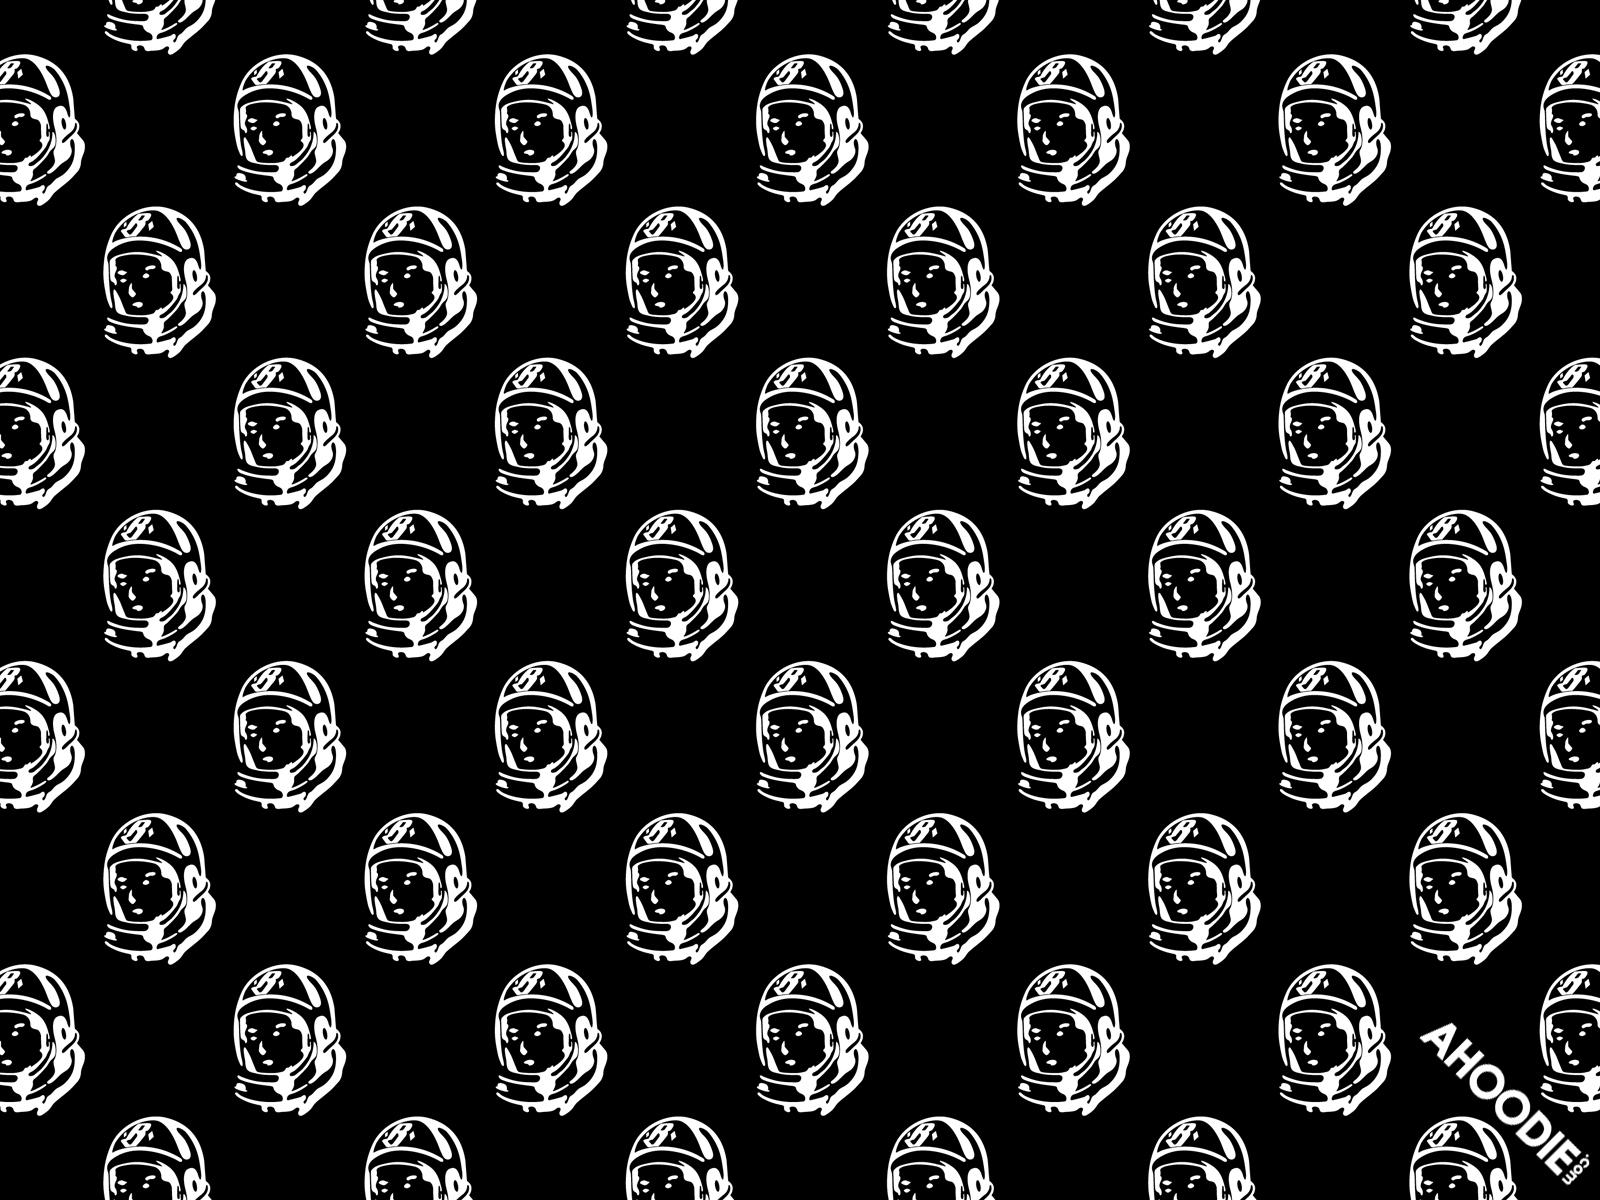 17] Hypebeast Wallpapers on WallpaperSafari 1600x1200